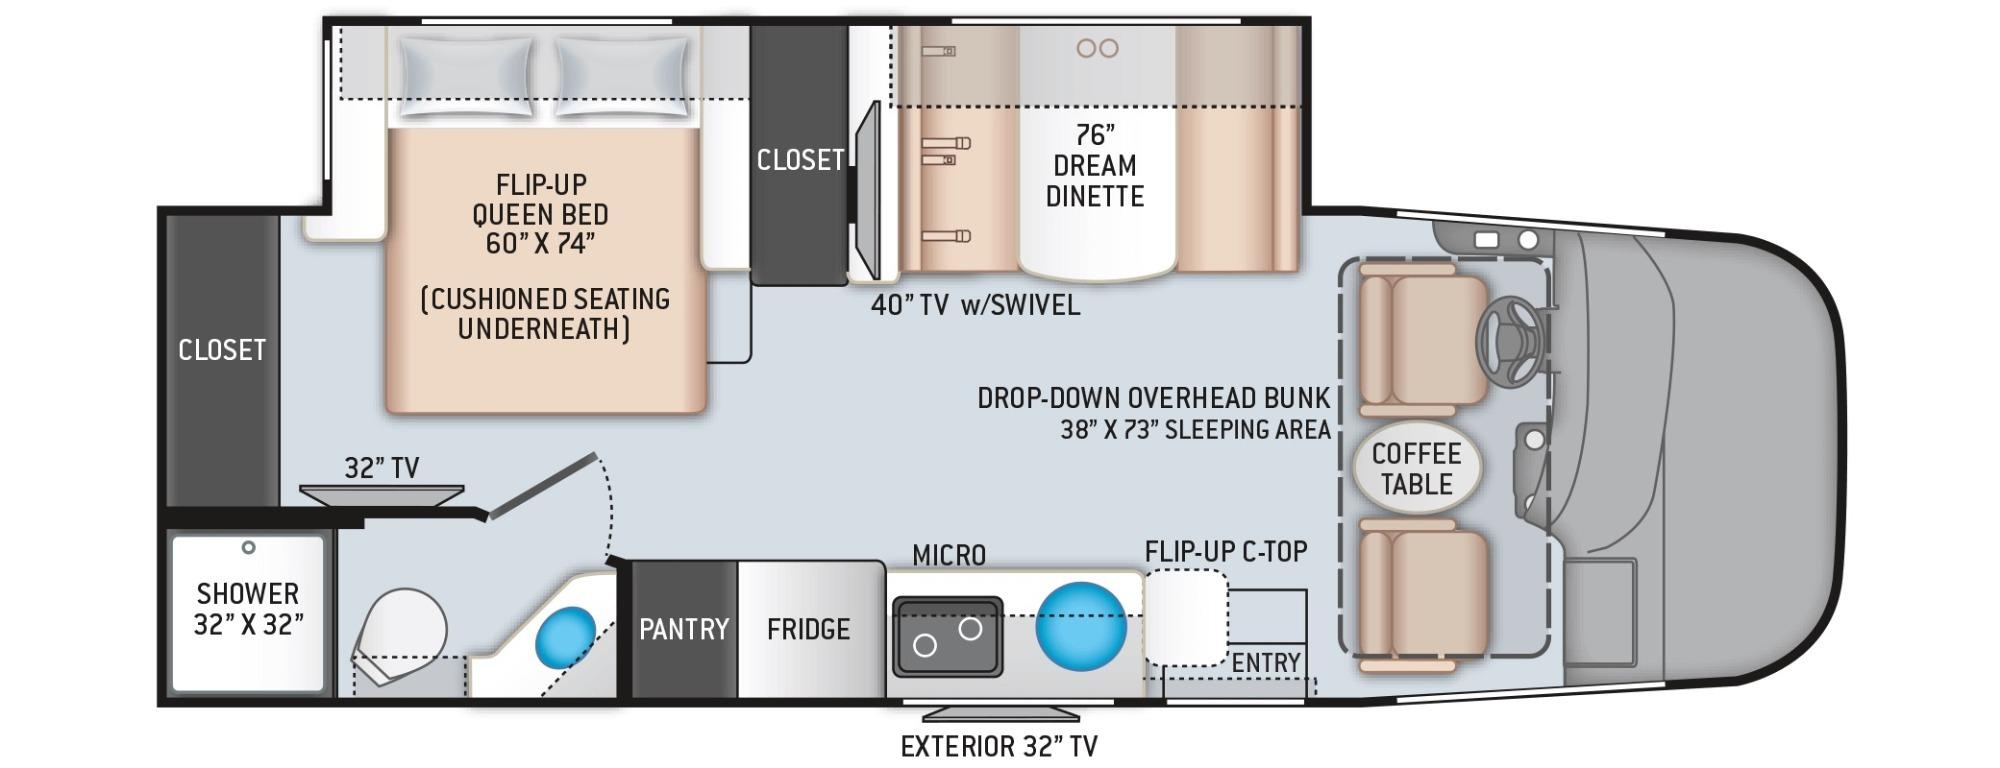 View Floor Plan for 2022 THOR VEGAS 25.6